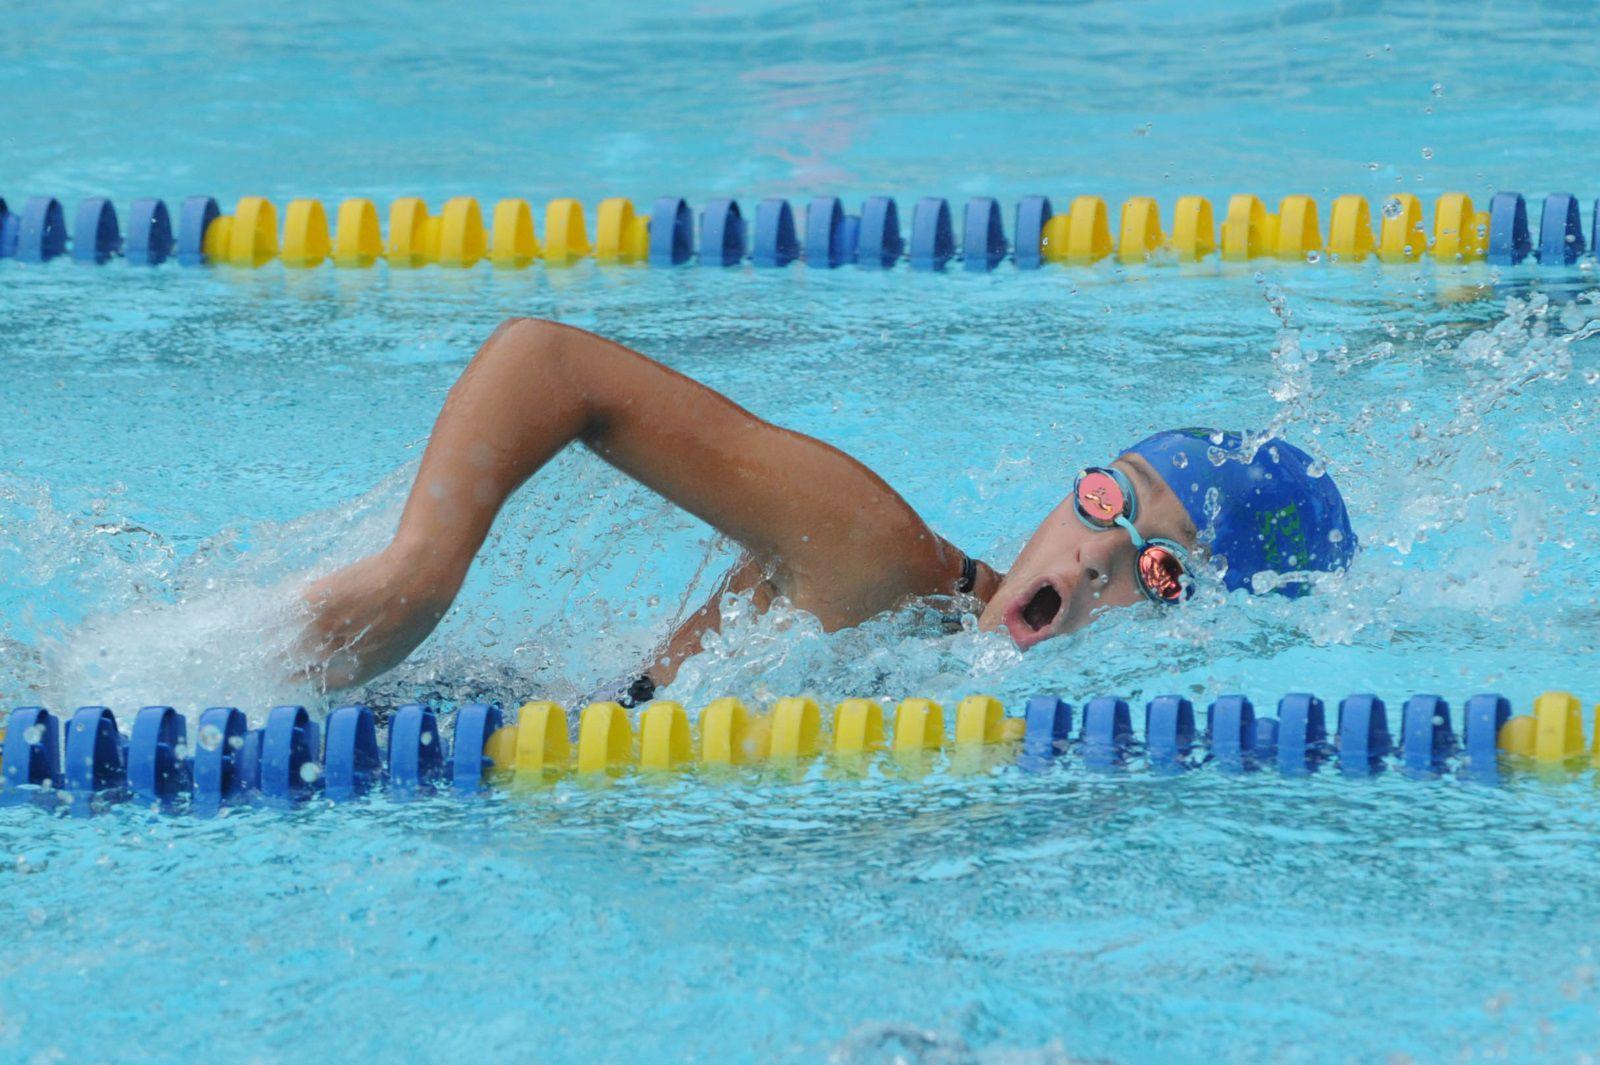 Jack alexy college swimming